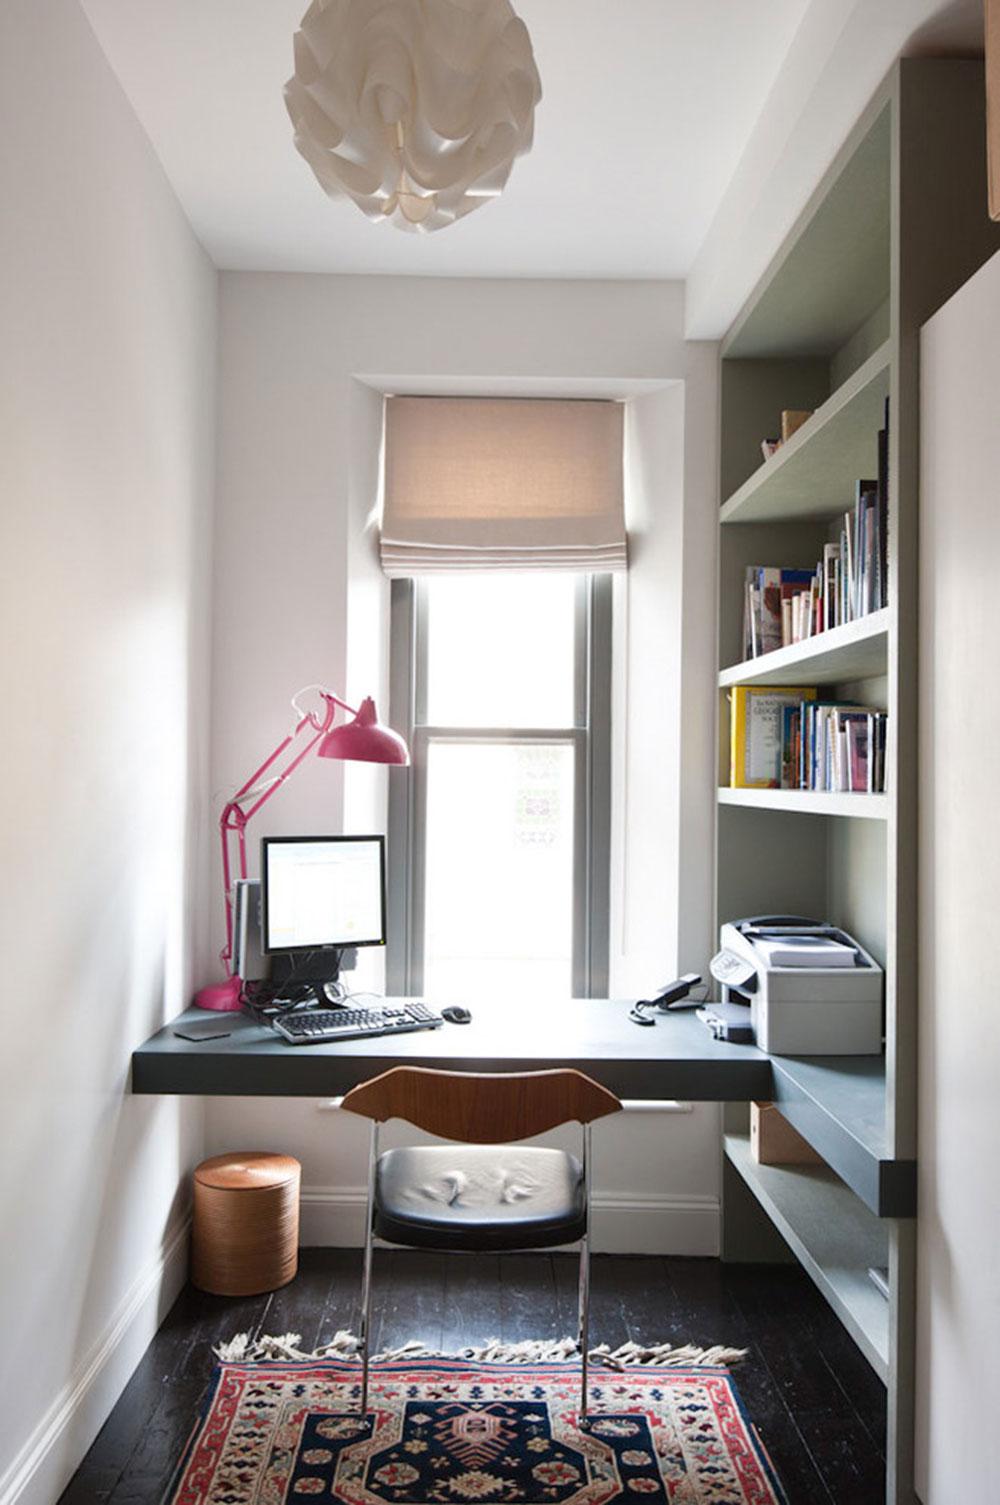 Diy-wall-desk-for-a-pleasant-job10 DIY wall-mount desk design ideas